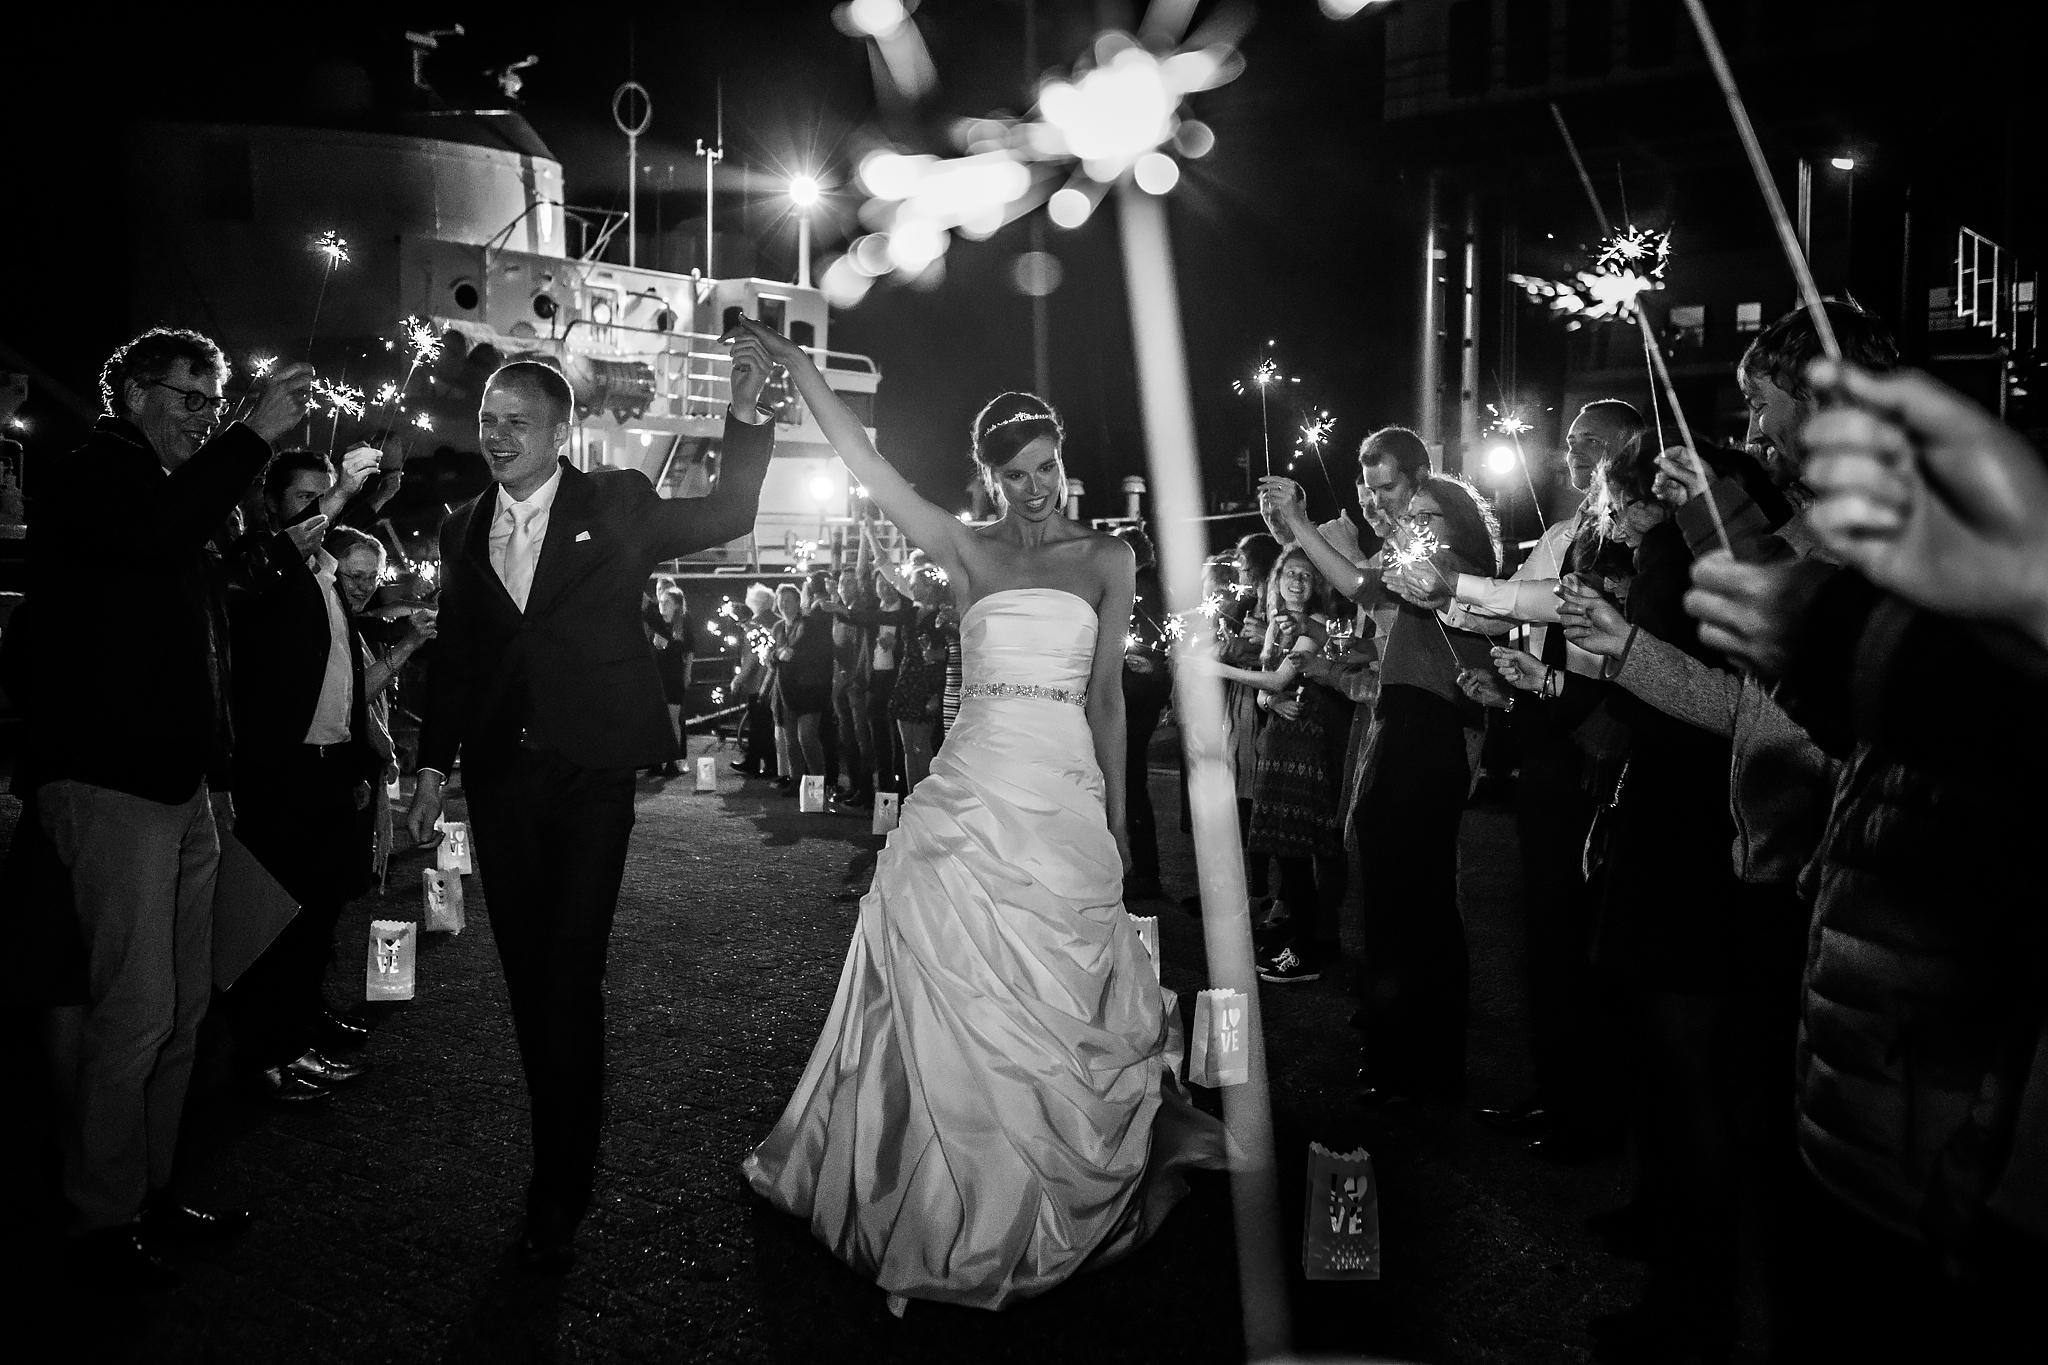 Bruidsreportage Wouter Catootje 2 – Bas Driessen Fotografie